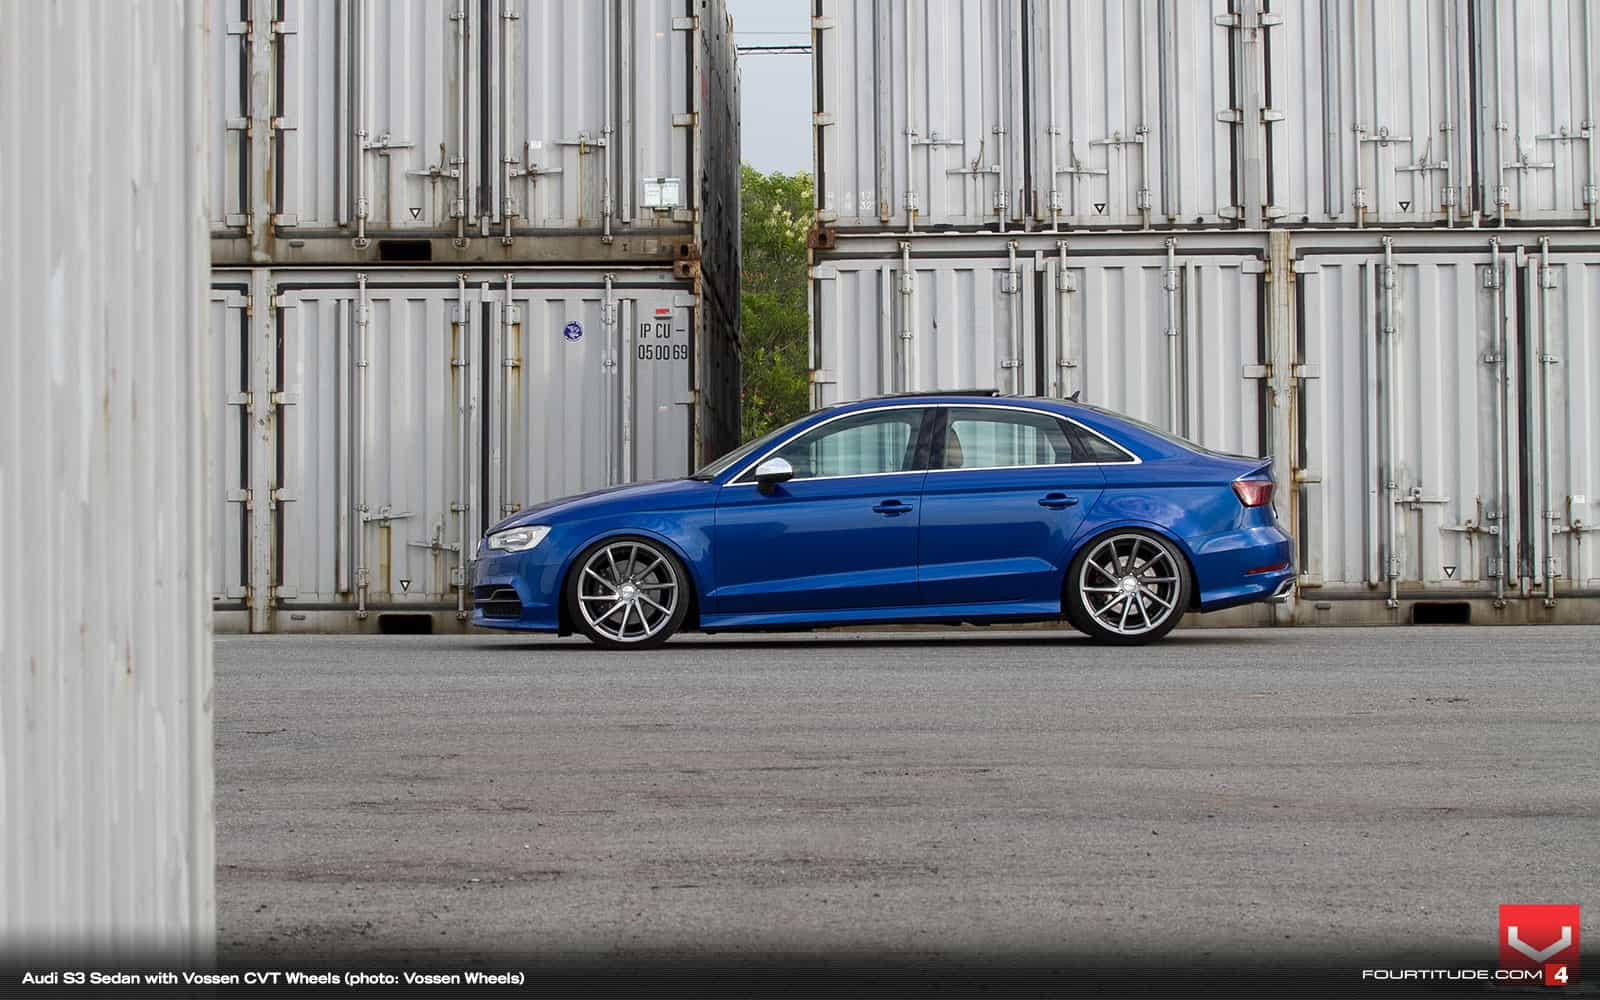 Audi-S3-sedan-Vossen-CVT-Naples-Speed-340 (1)